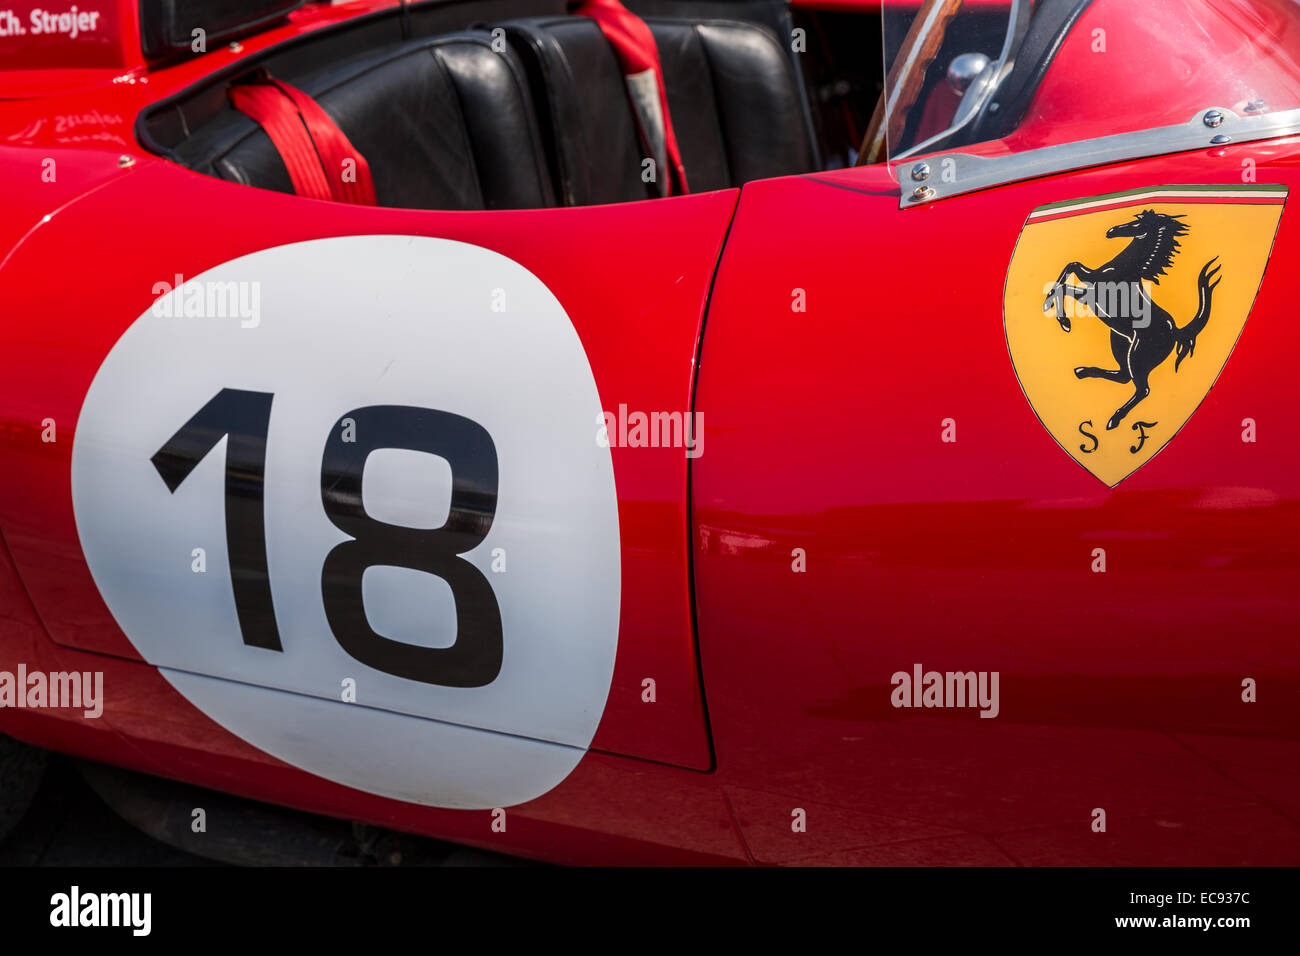 Details from a Ferrari 250  TR 59 Testa Rossa, Copenhagen, Denmark - Stock Image